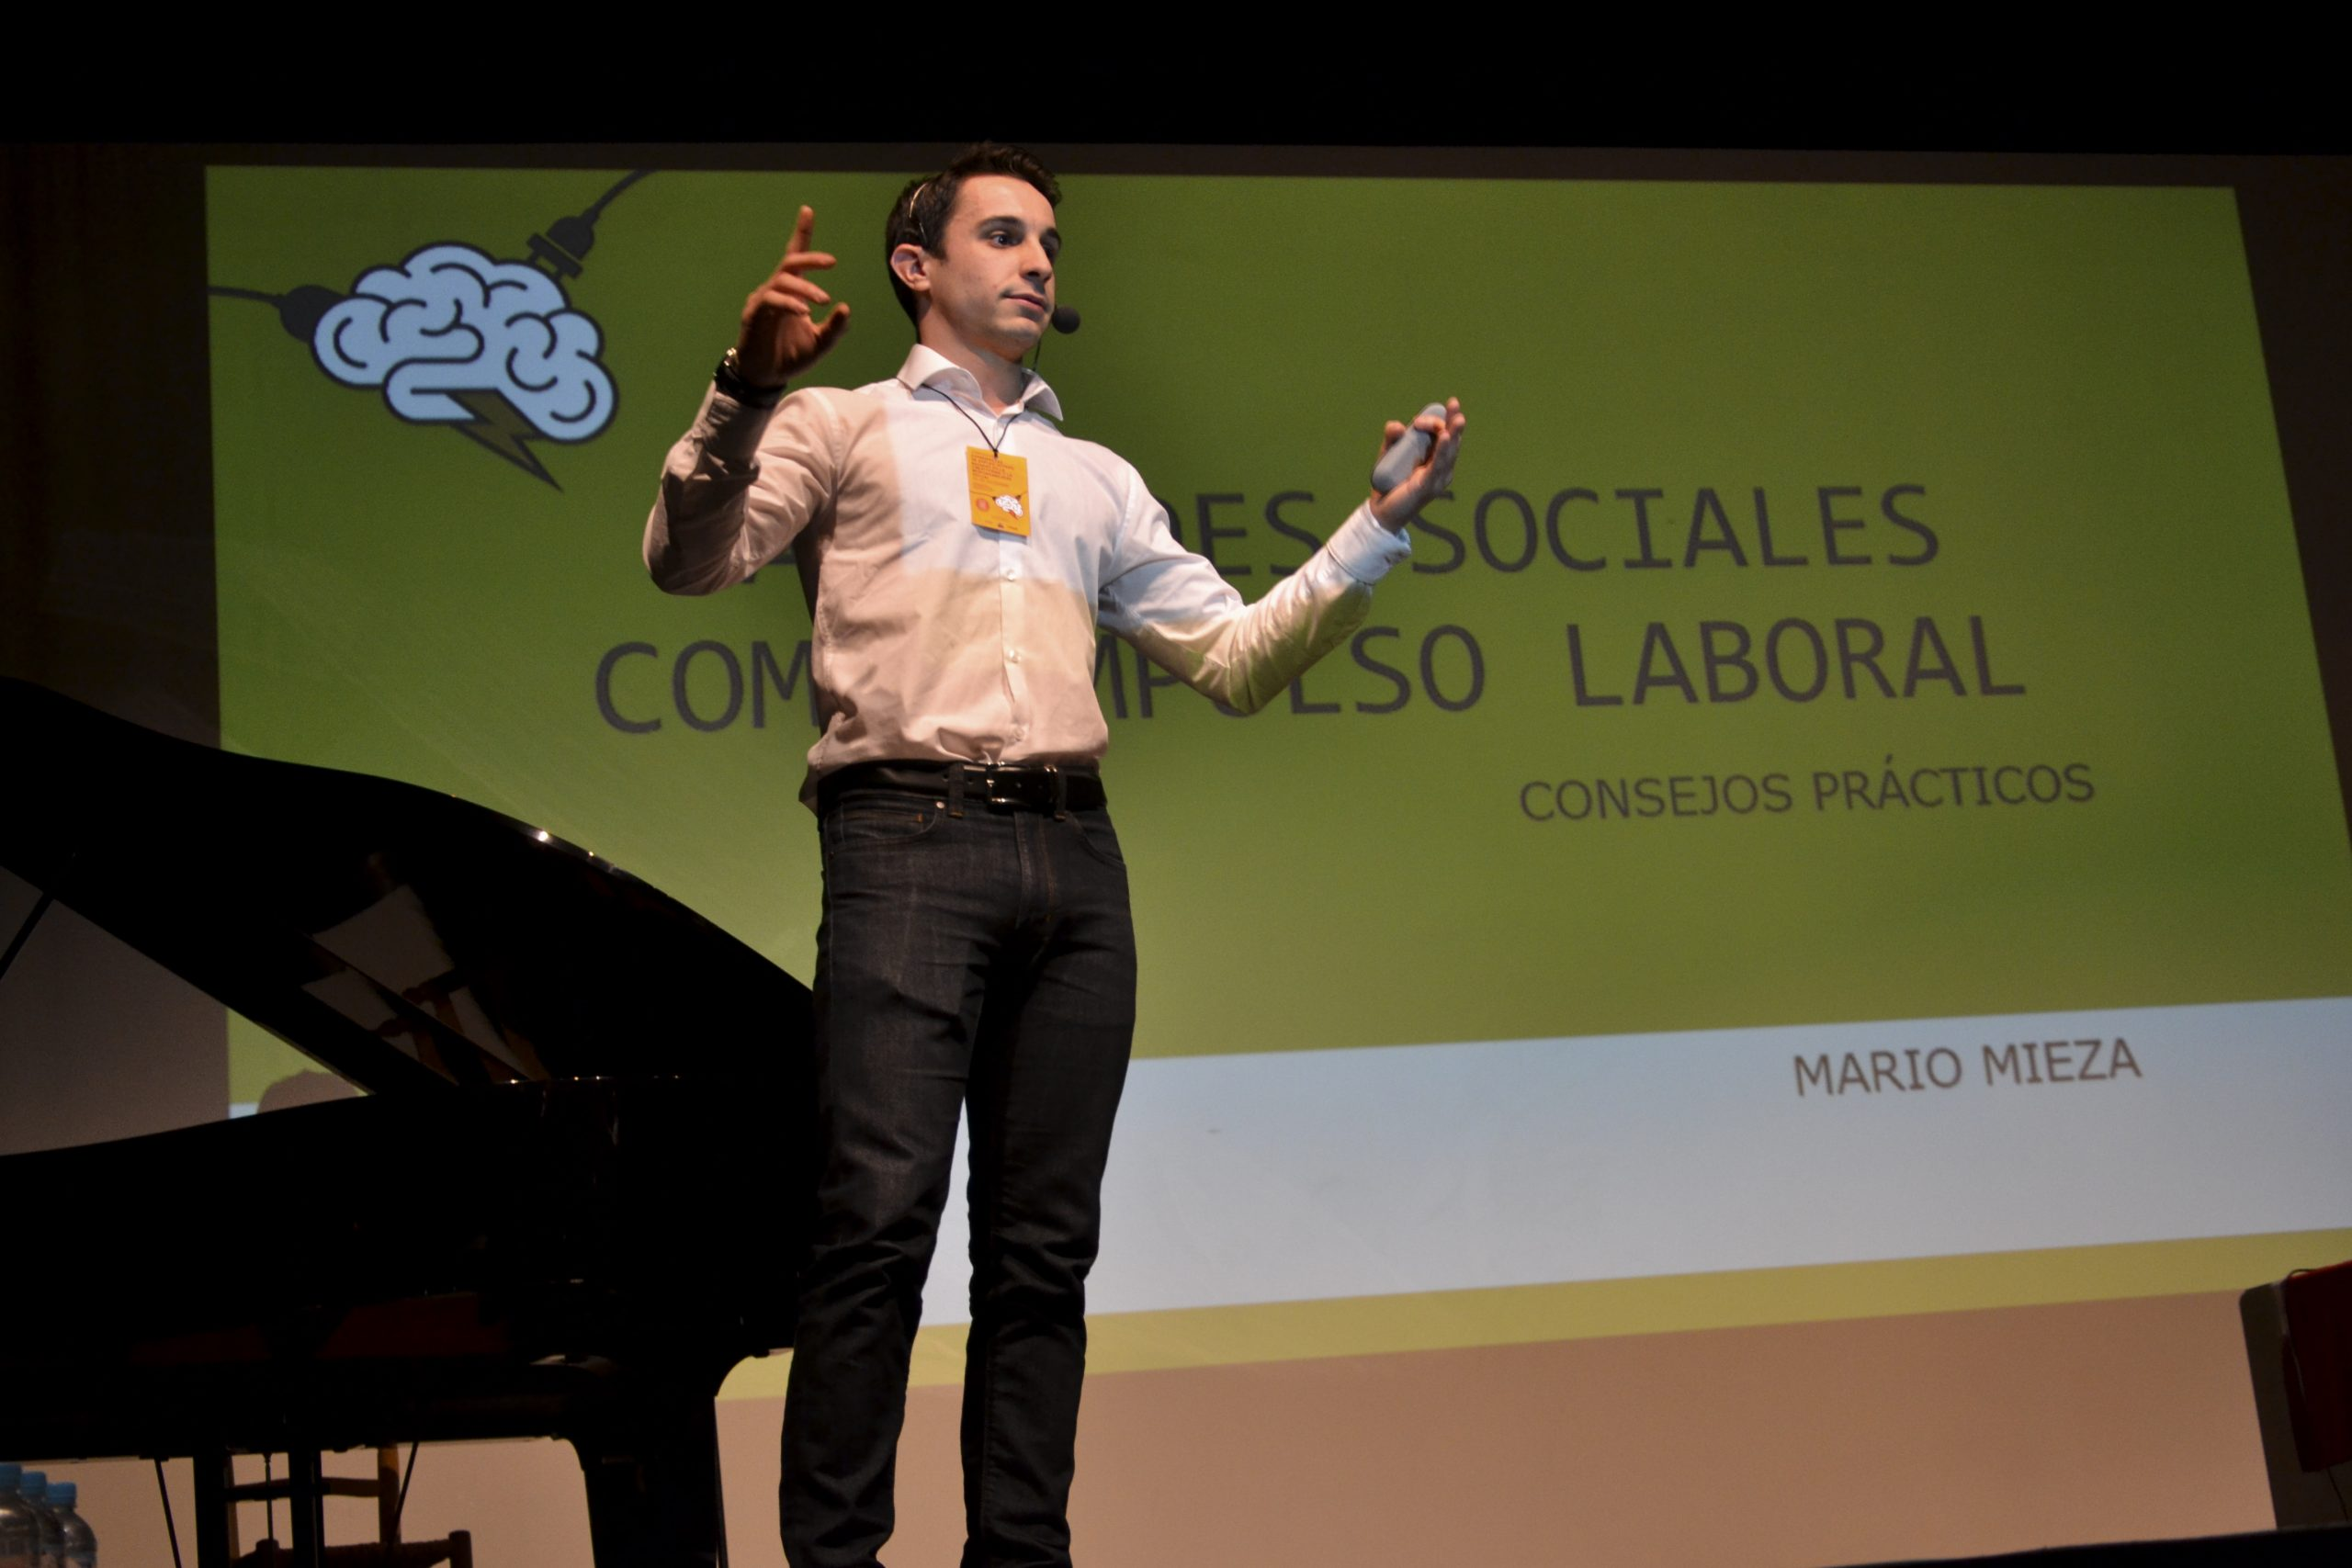 Jornadas-Mejorada-2018-Mario-Mieza-2-scaled